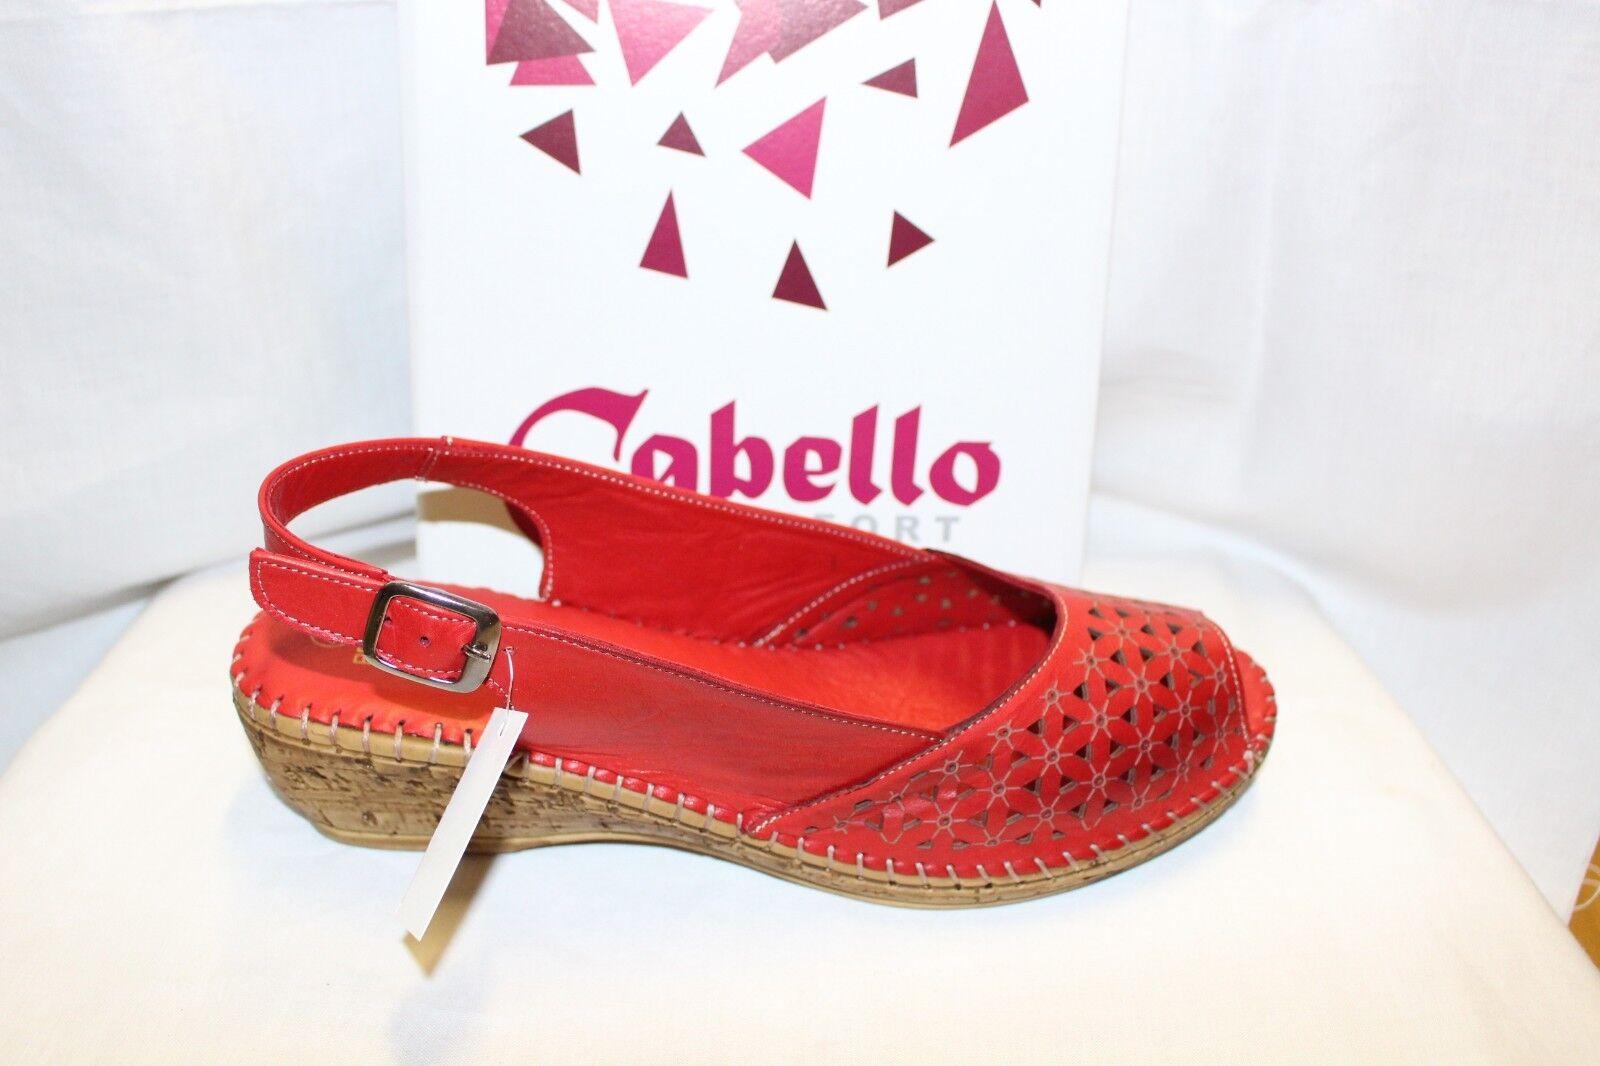 Ladies scarpe FOOTWEAR - Cabello sandal RE768 rosso